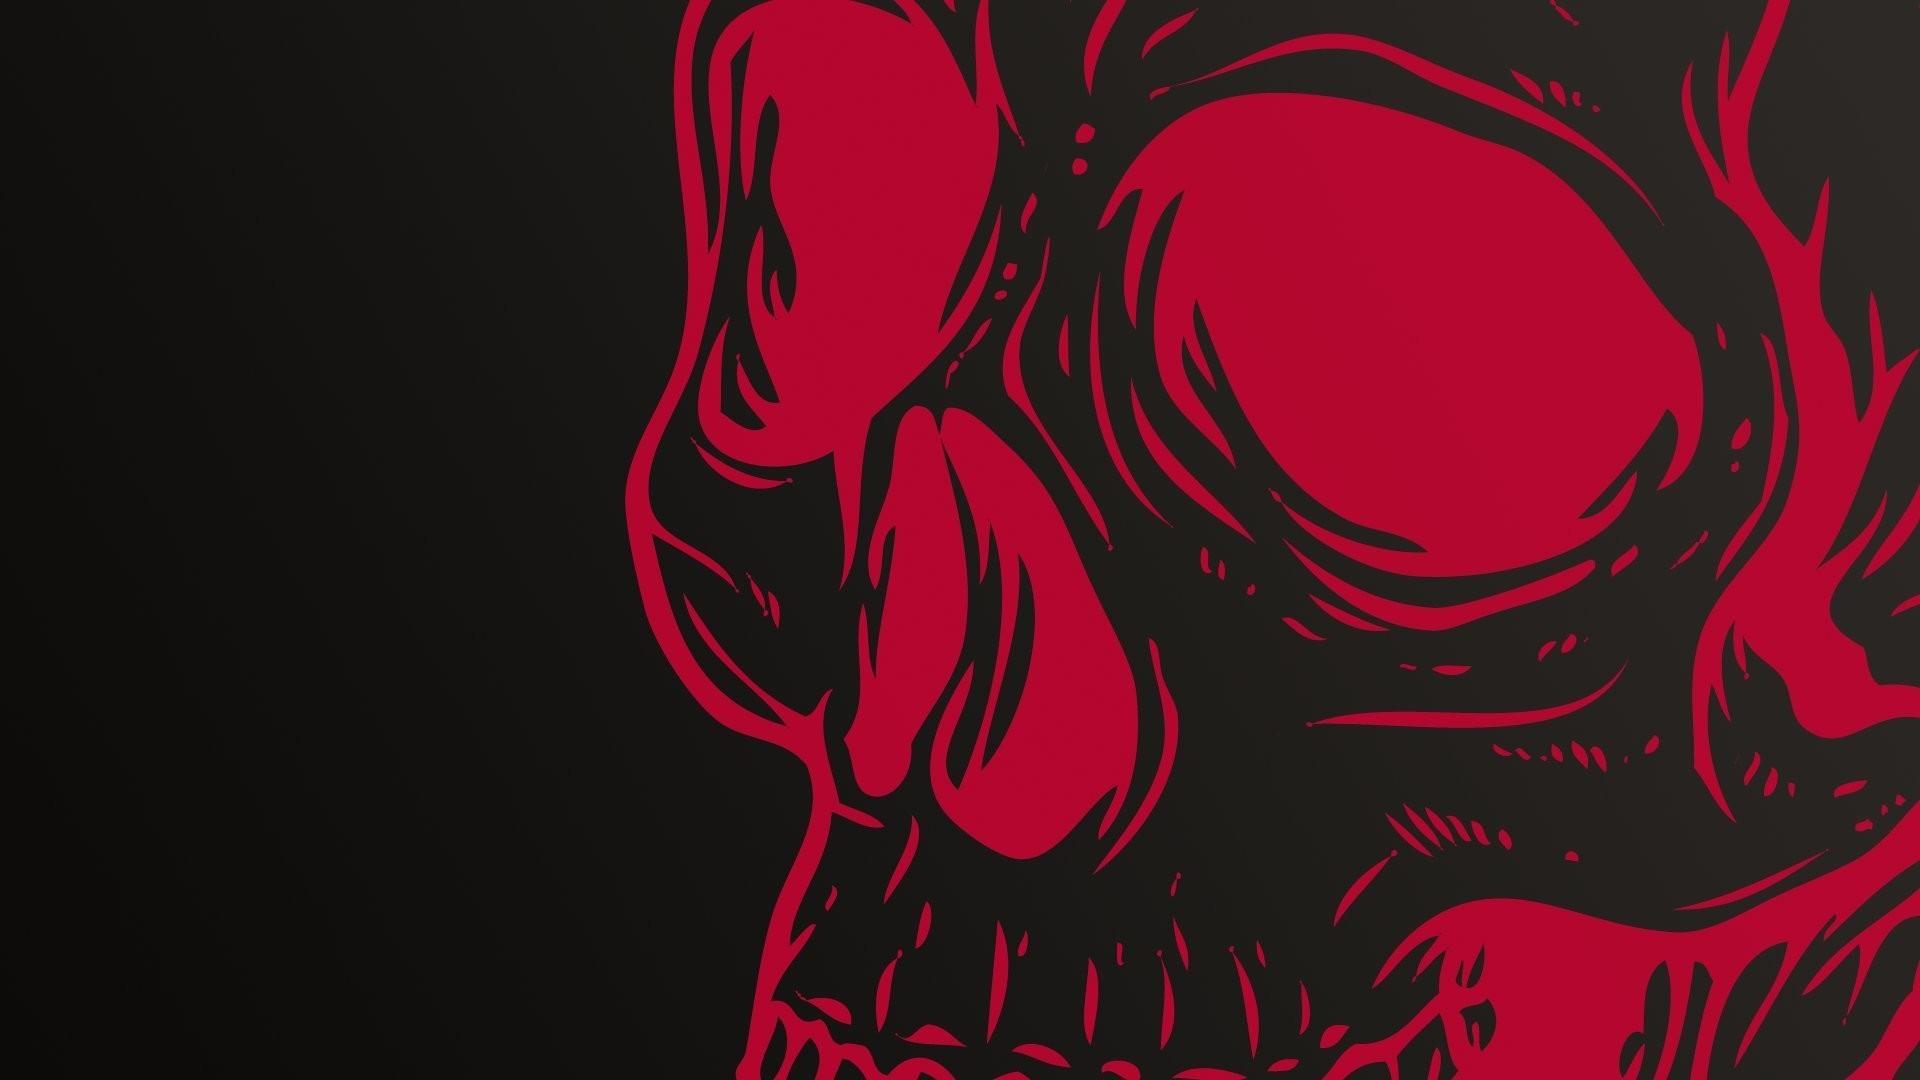 Wonderful Wallpaper Marvel Abstract - 1206223-new-marvel-red-skull-wallpaper-1920x1080  Pic_639474.jpg